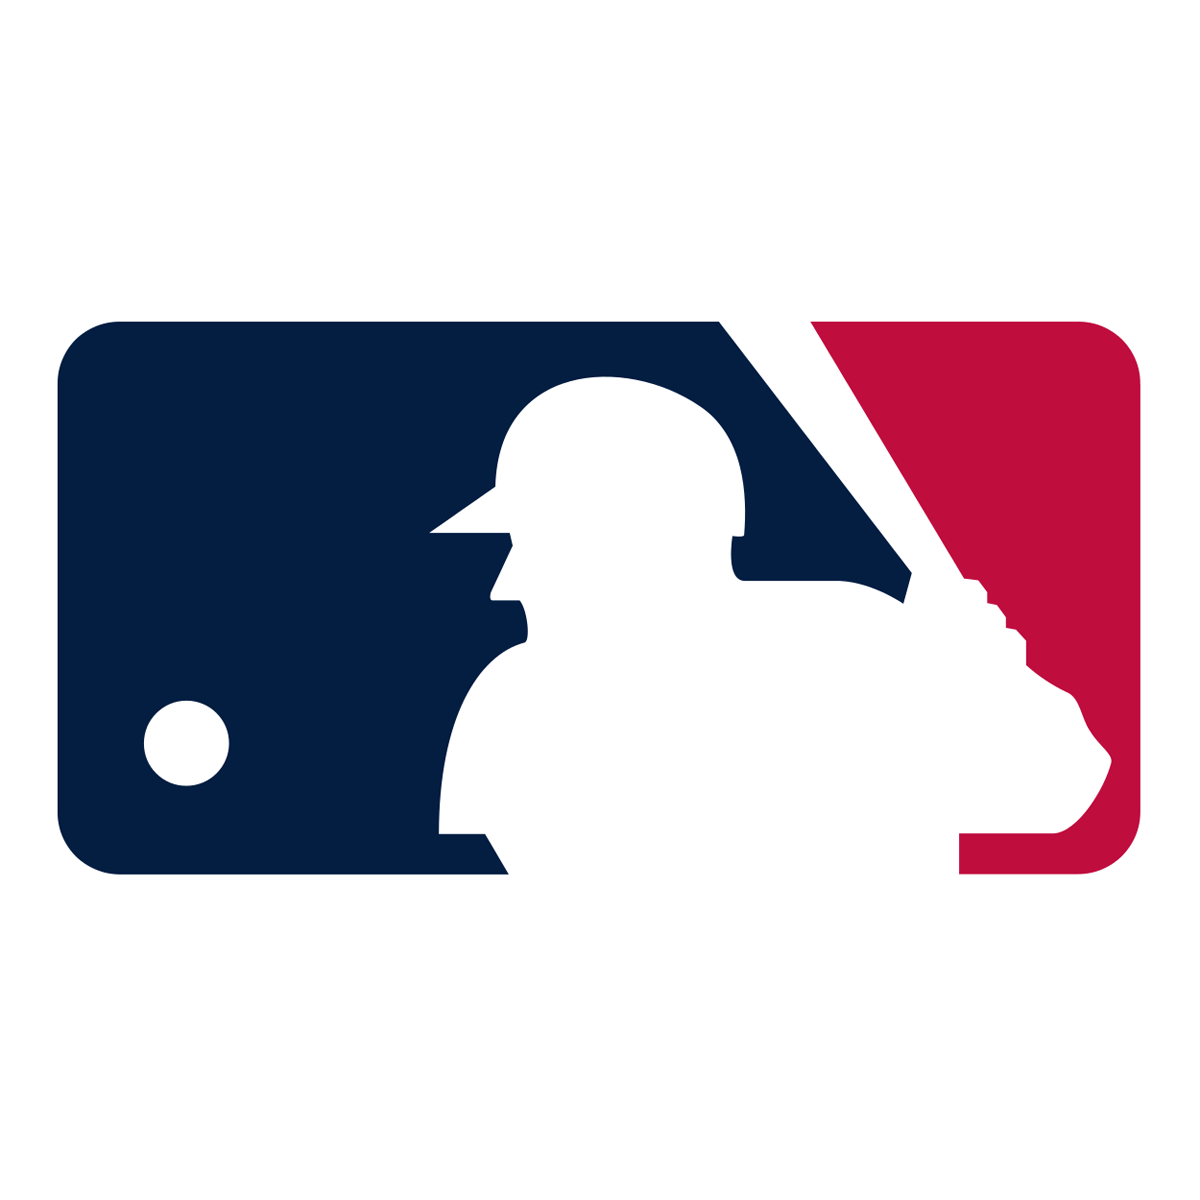 Major League Baseball transparent logo